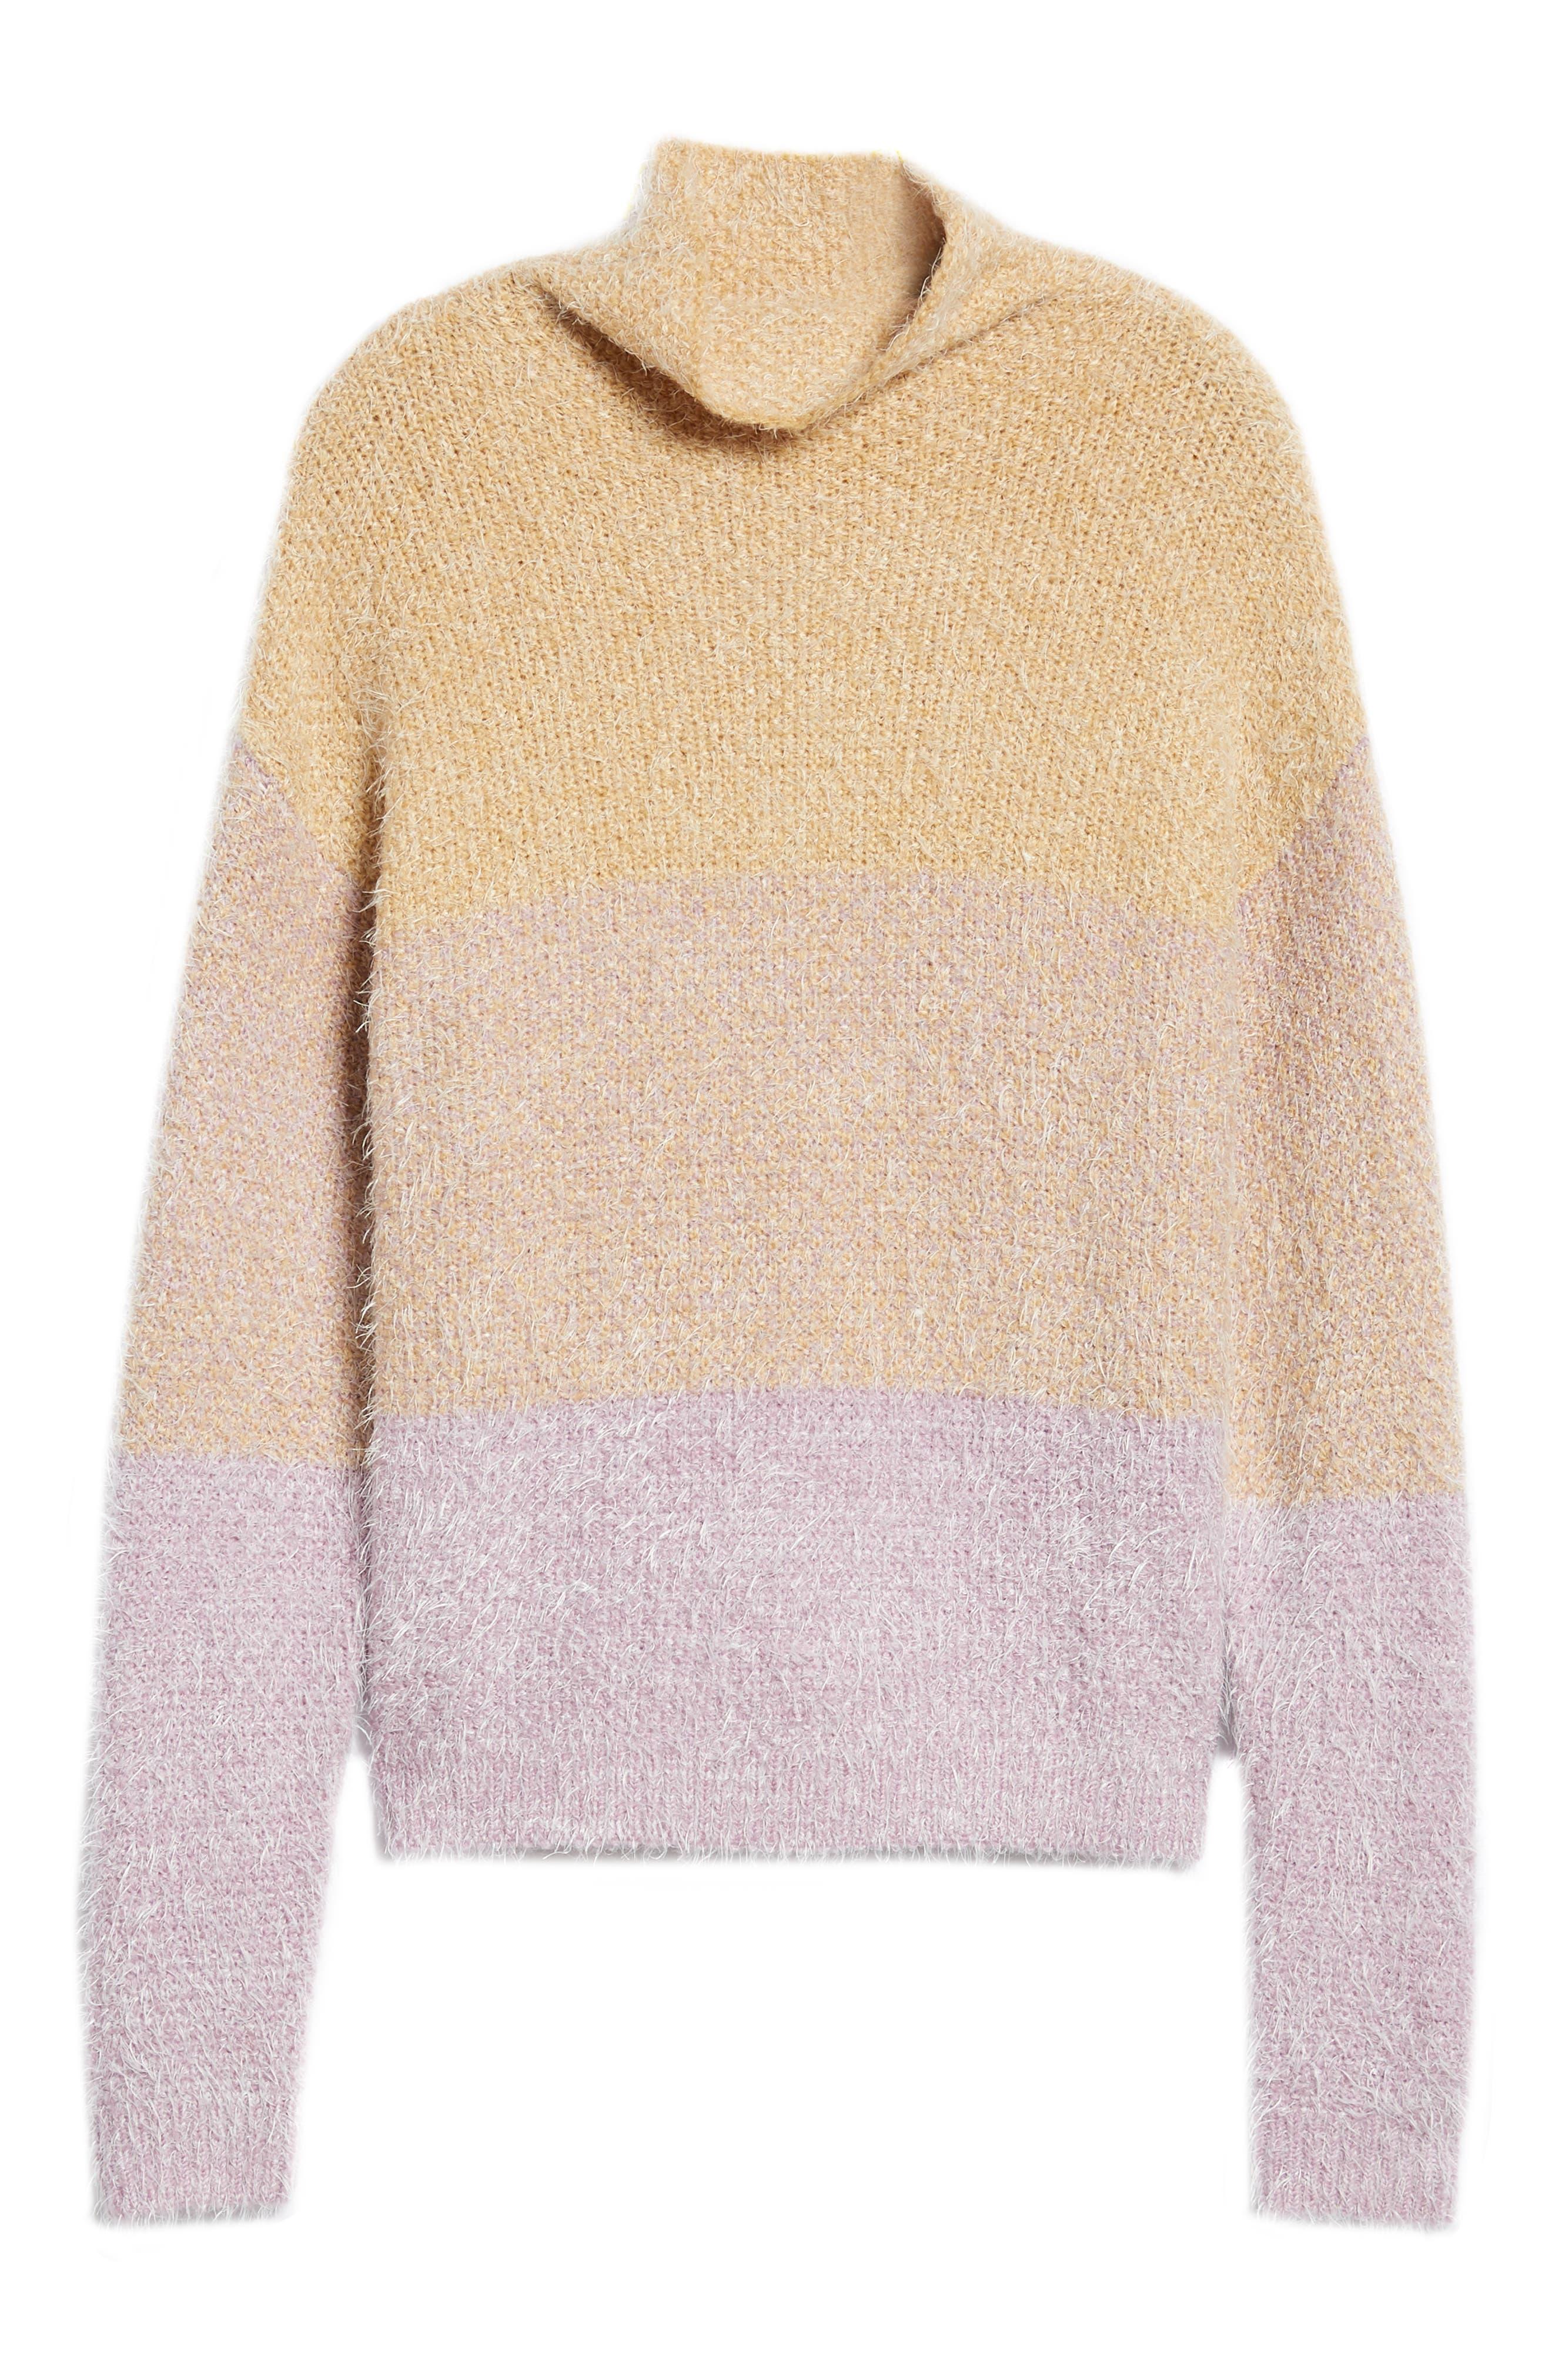 BP., Ombré Eyelash Sweater, Alternate thumbnail 6, color, 680